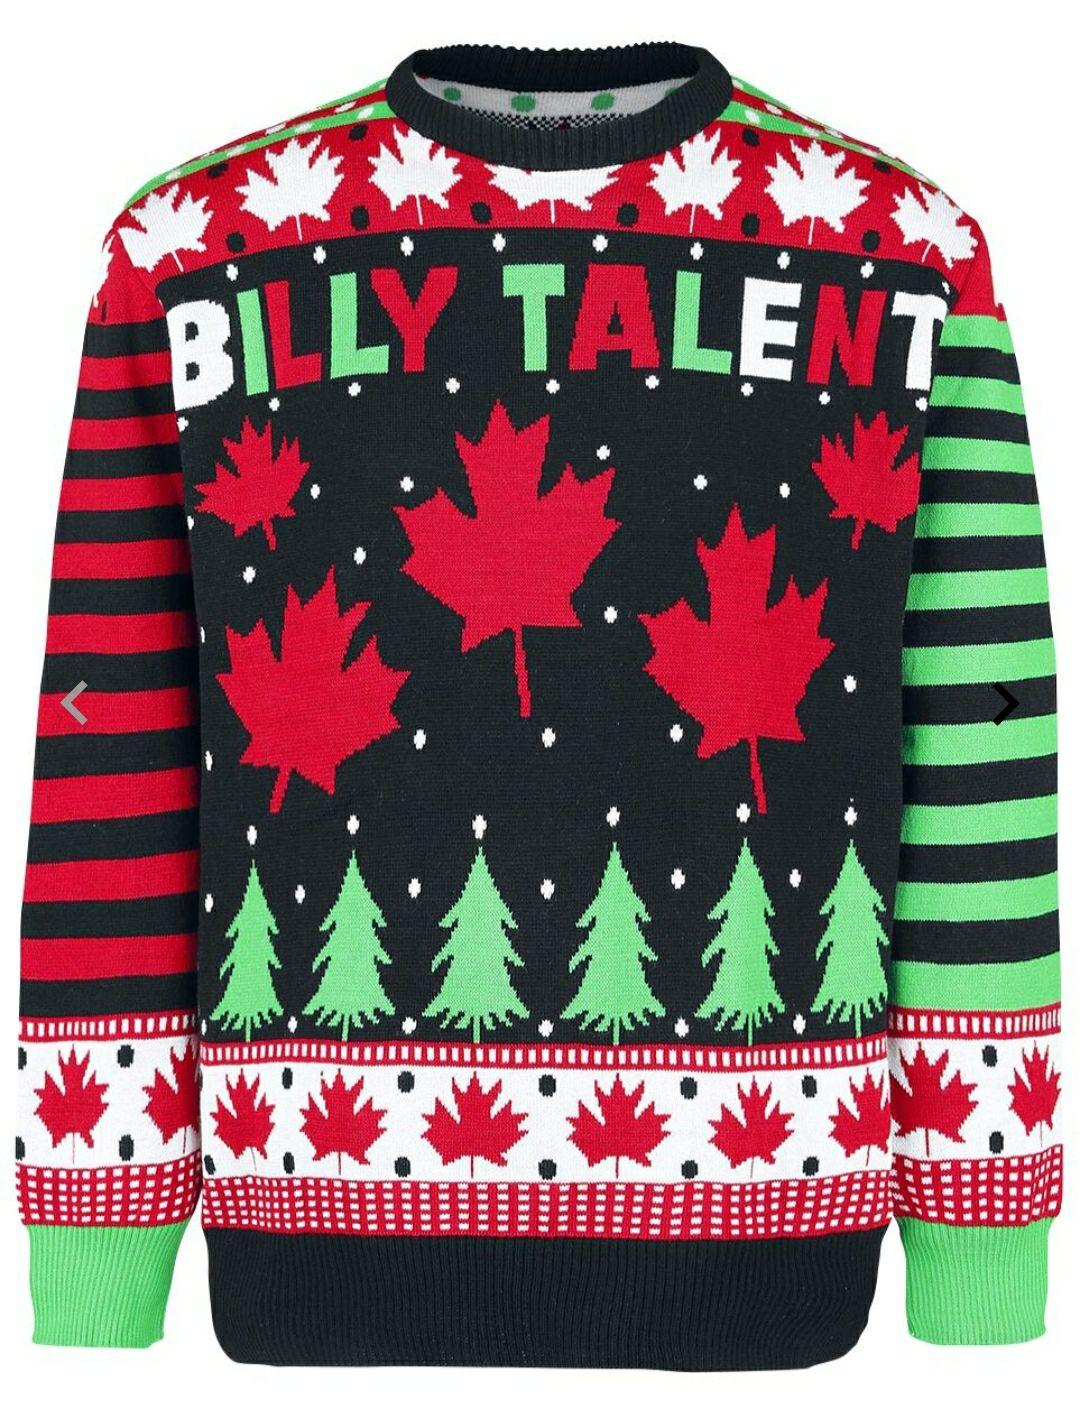 Christmas Sweater teils -70%